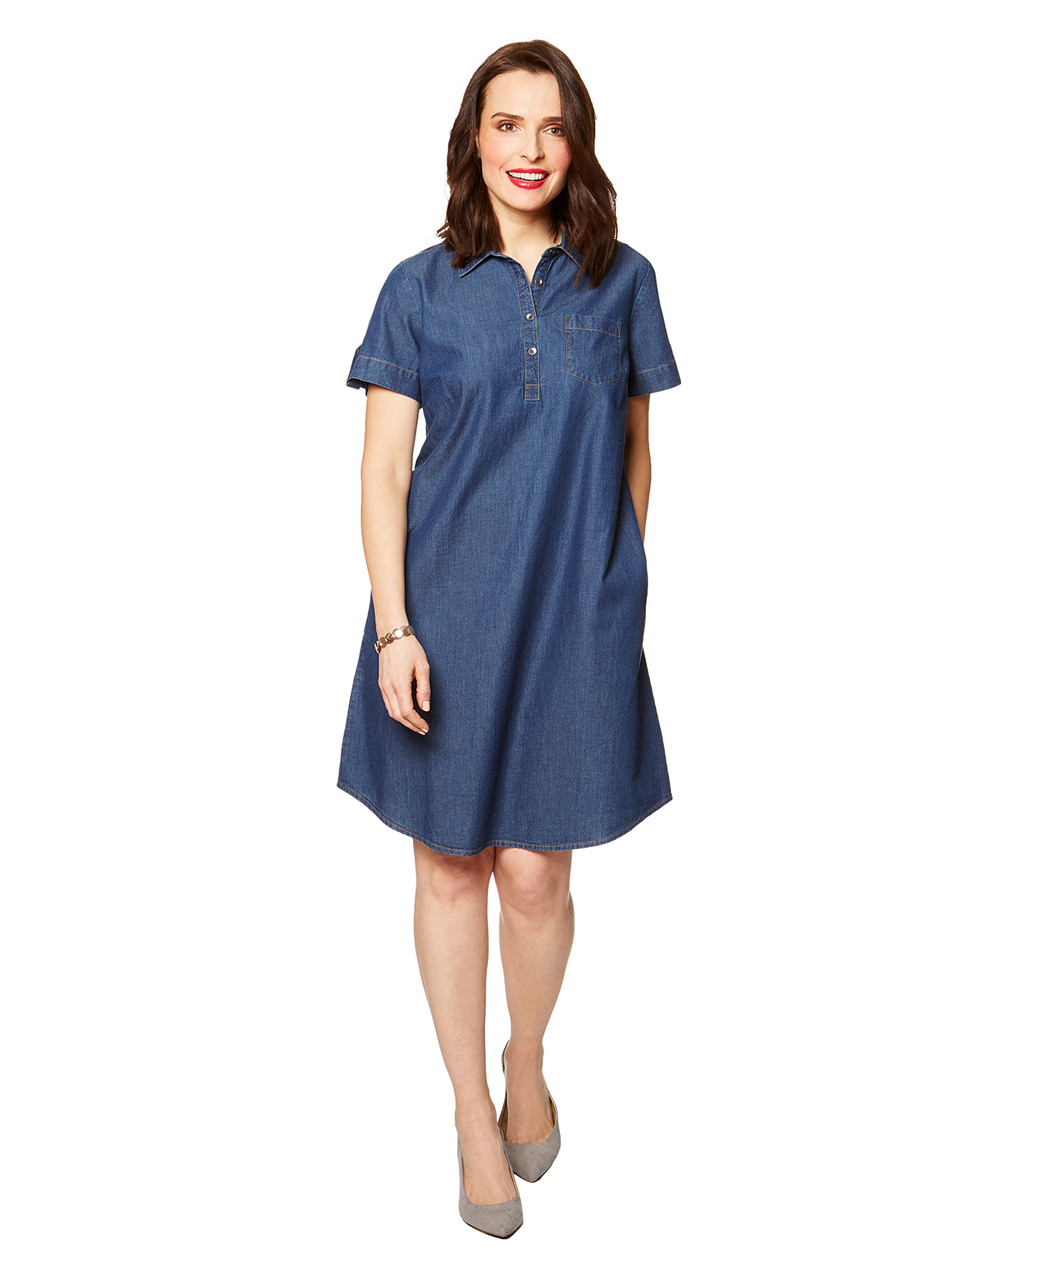 3ec70eb377 Women s Short Sleeve Denim Dress